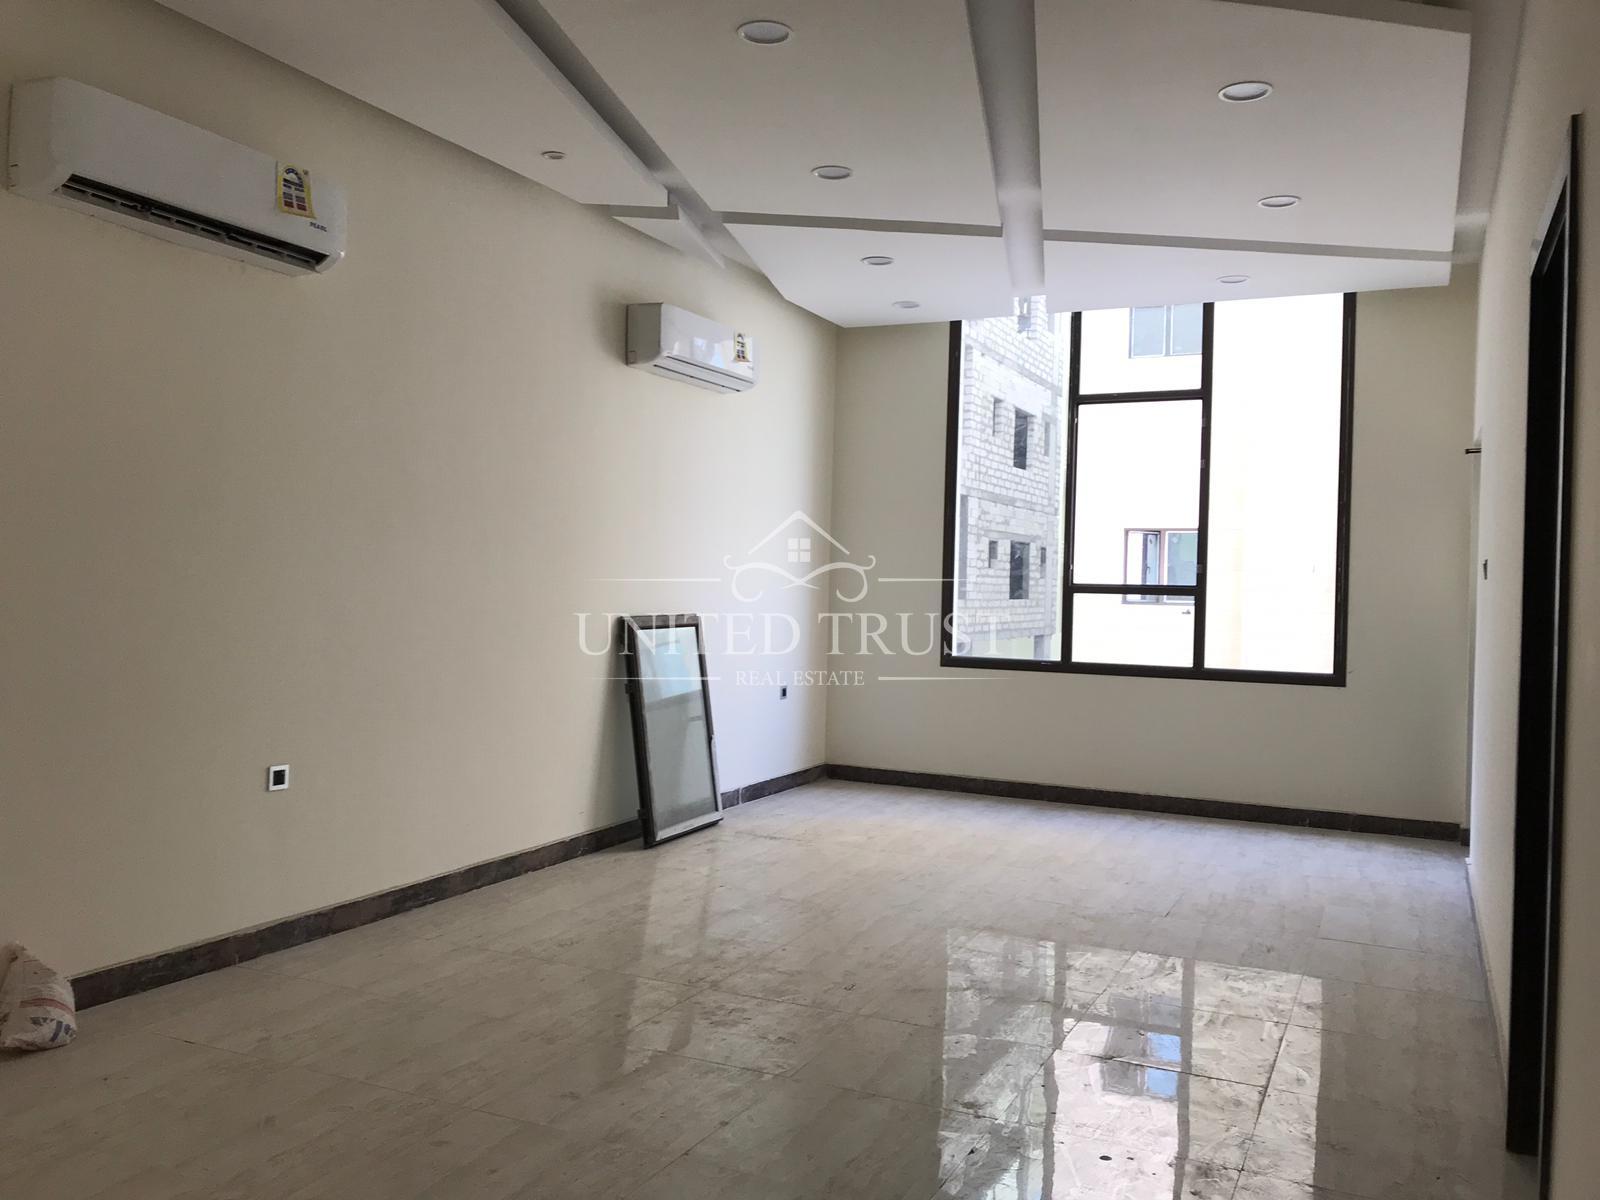 For sale a new 4 bedrooms flats in Hidd Ref: HID-AZ-009